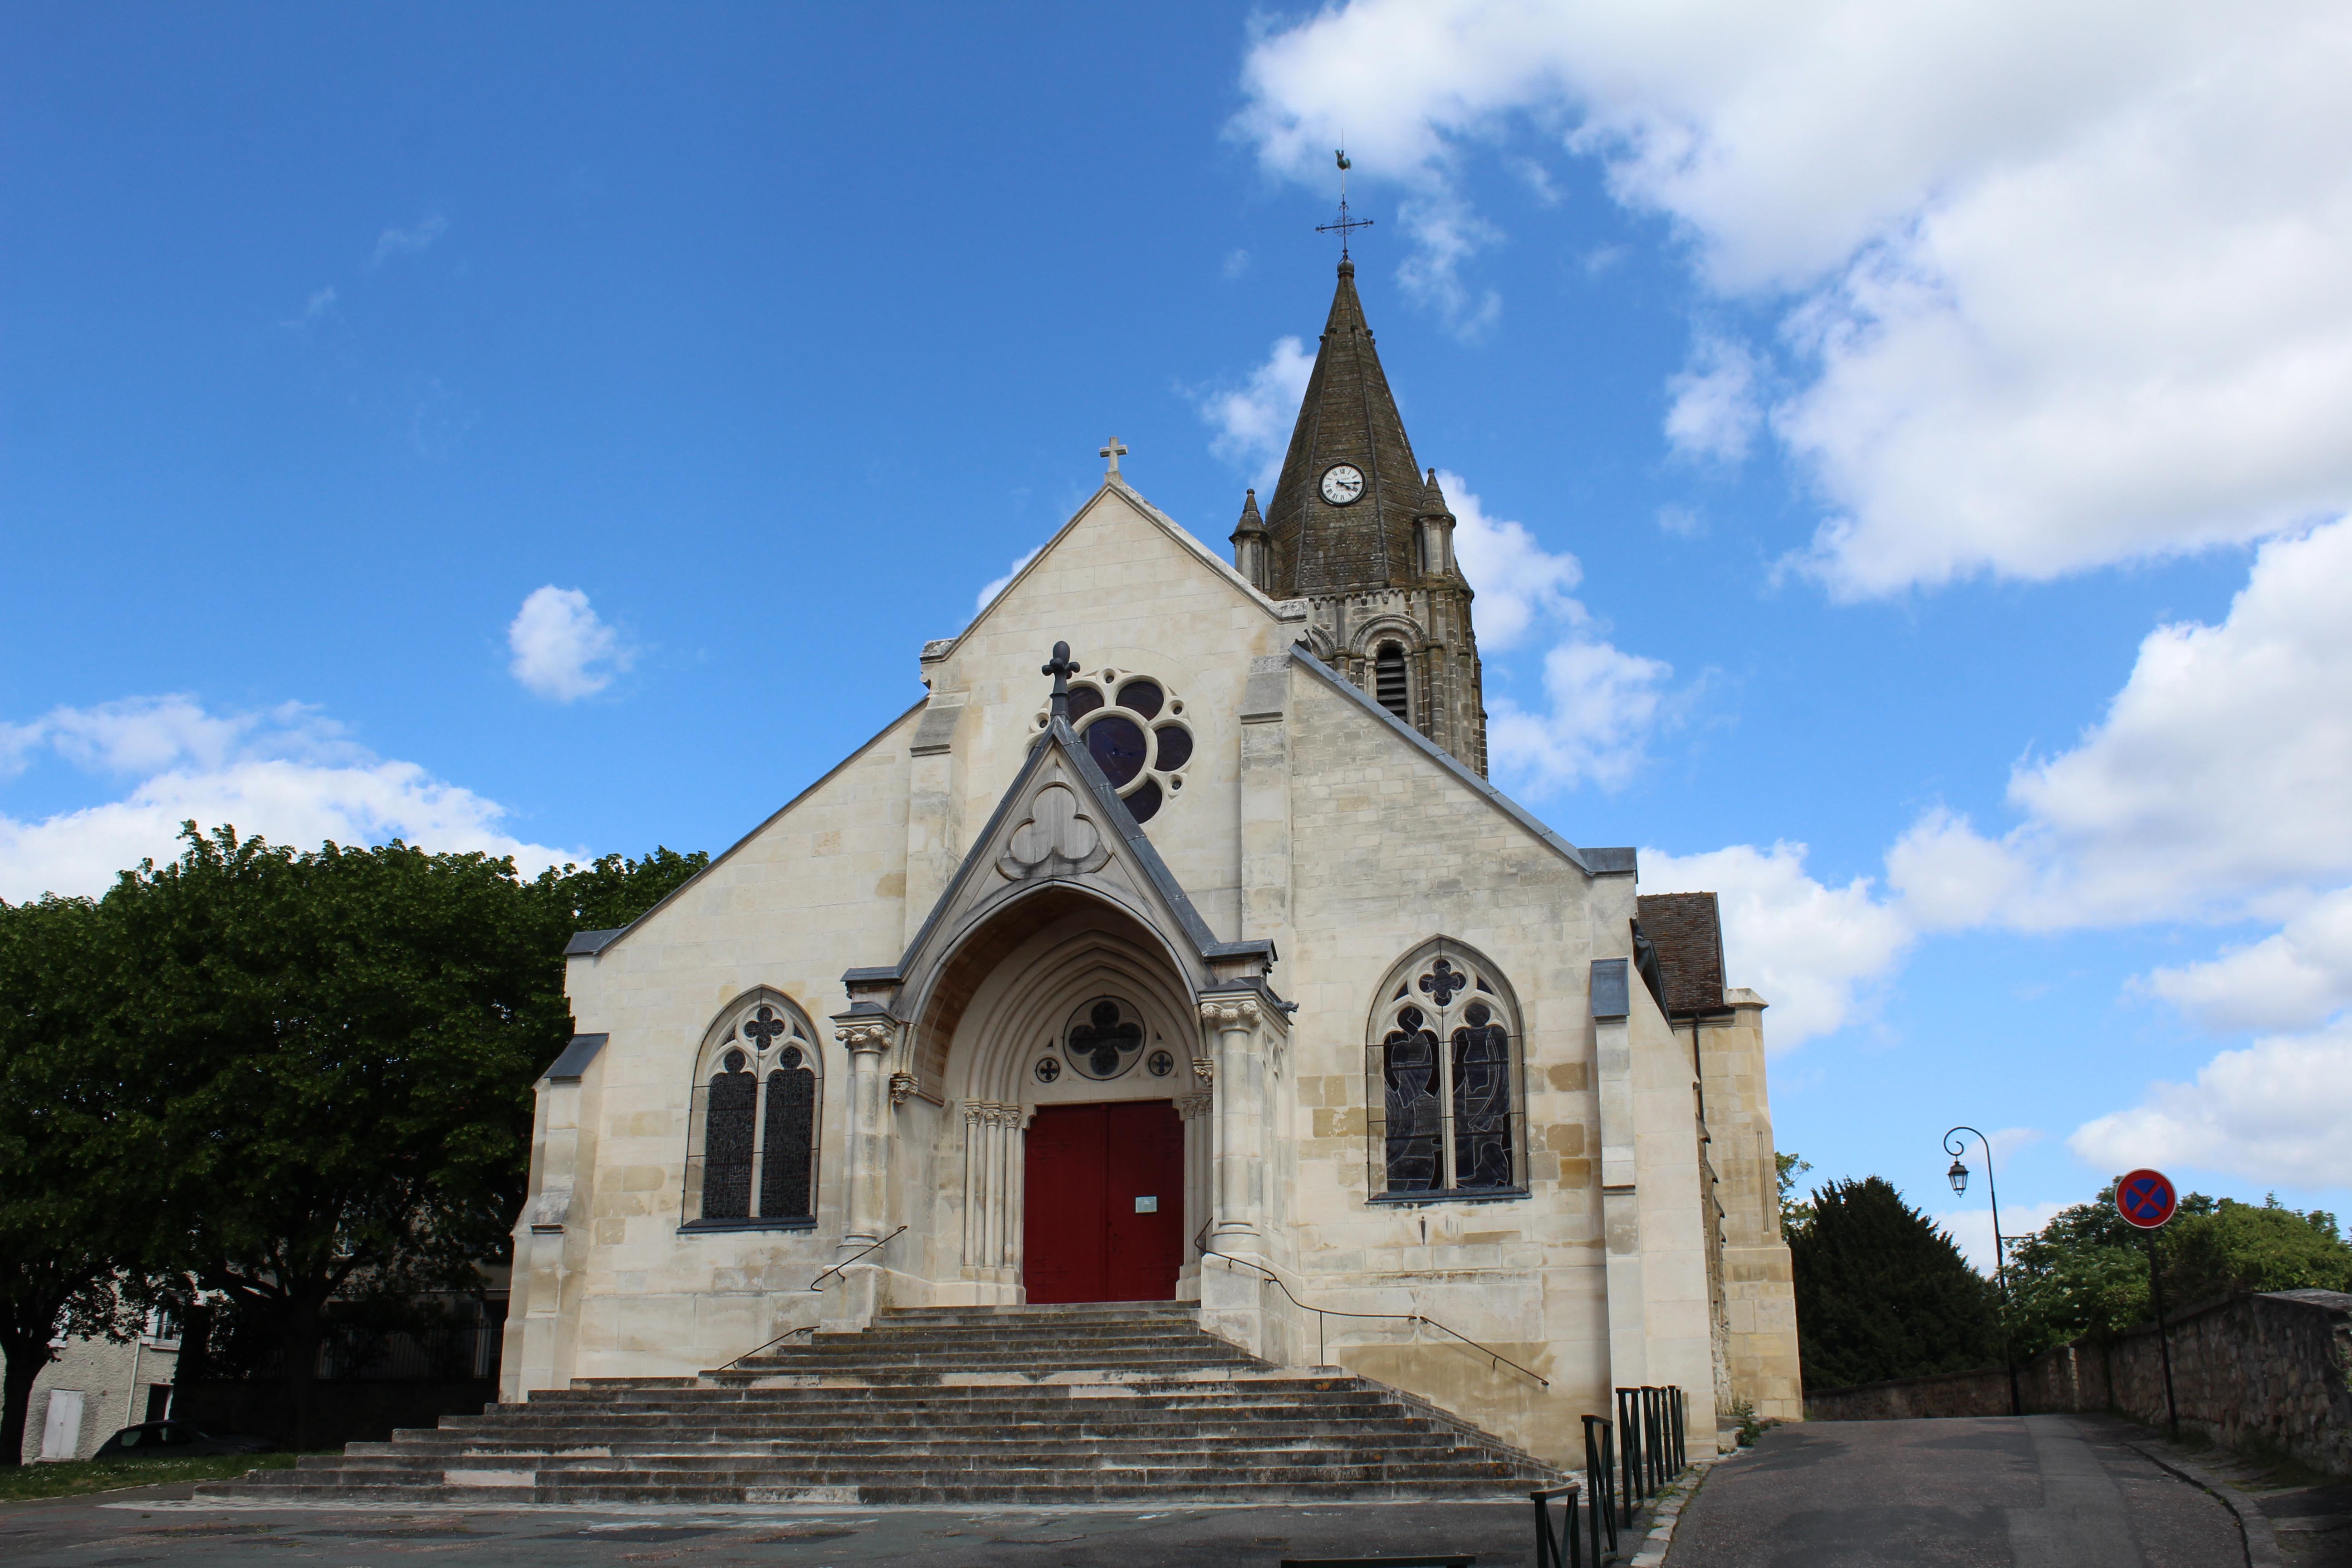 Eglise Saint-Maclou, Conflans-Sainte-Honorine